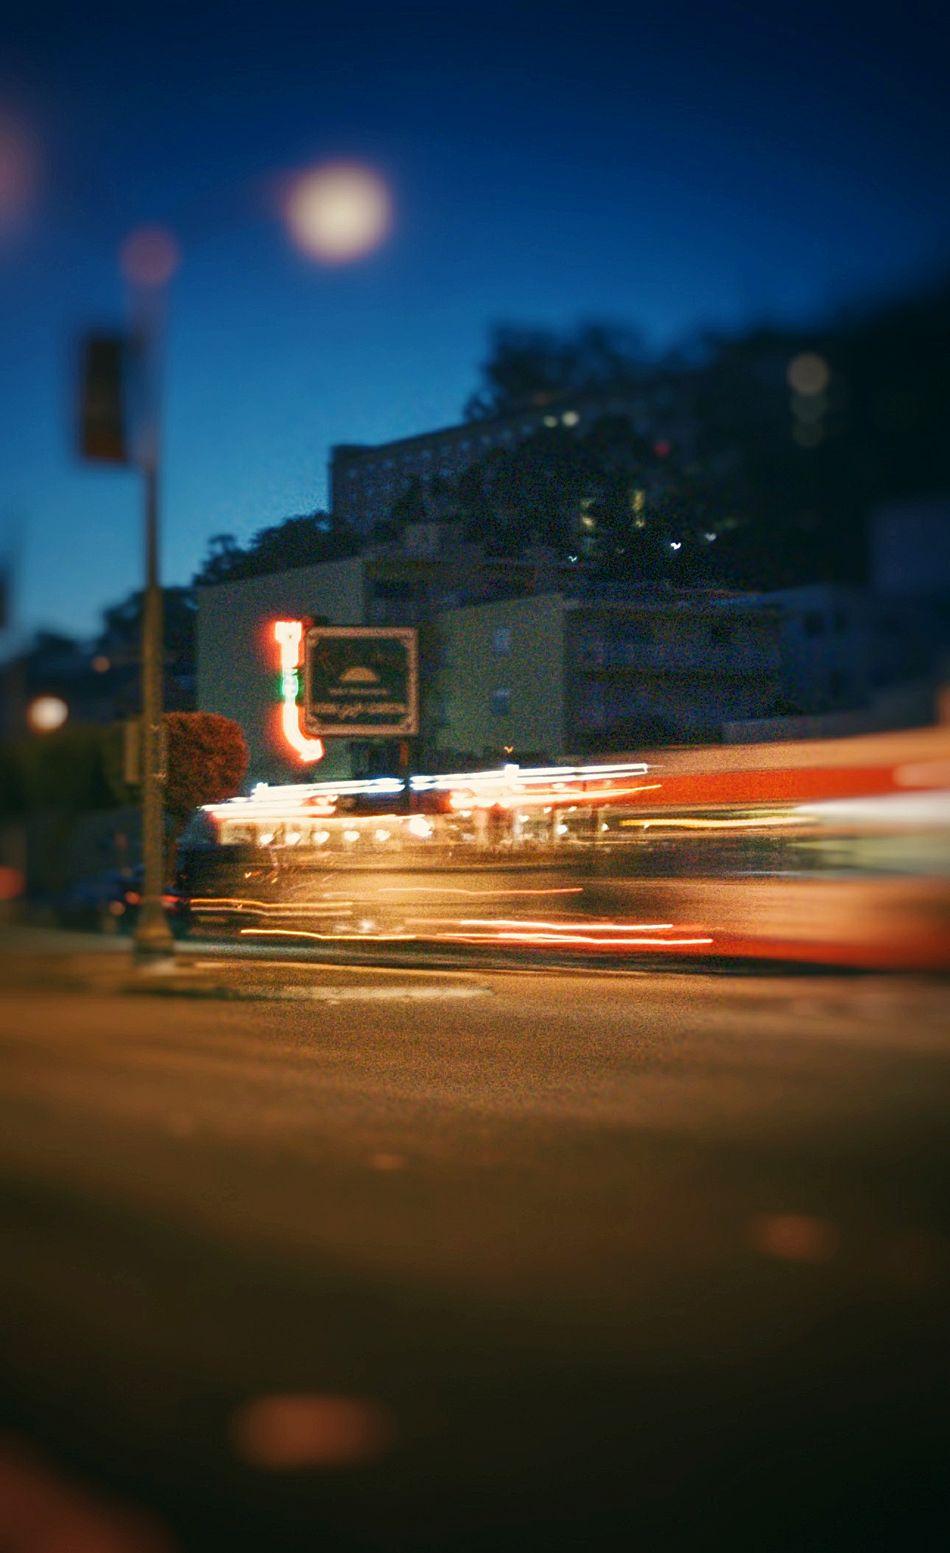 Gearyblvd SanFranciscoBay Slow Shutter Lighttrailsphotography Oneplusphotograpgy Early Morning Timesflies